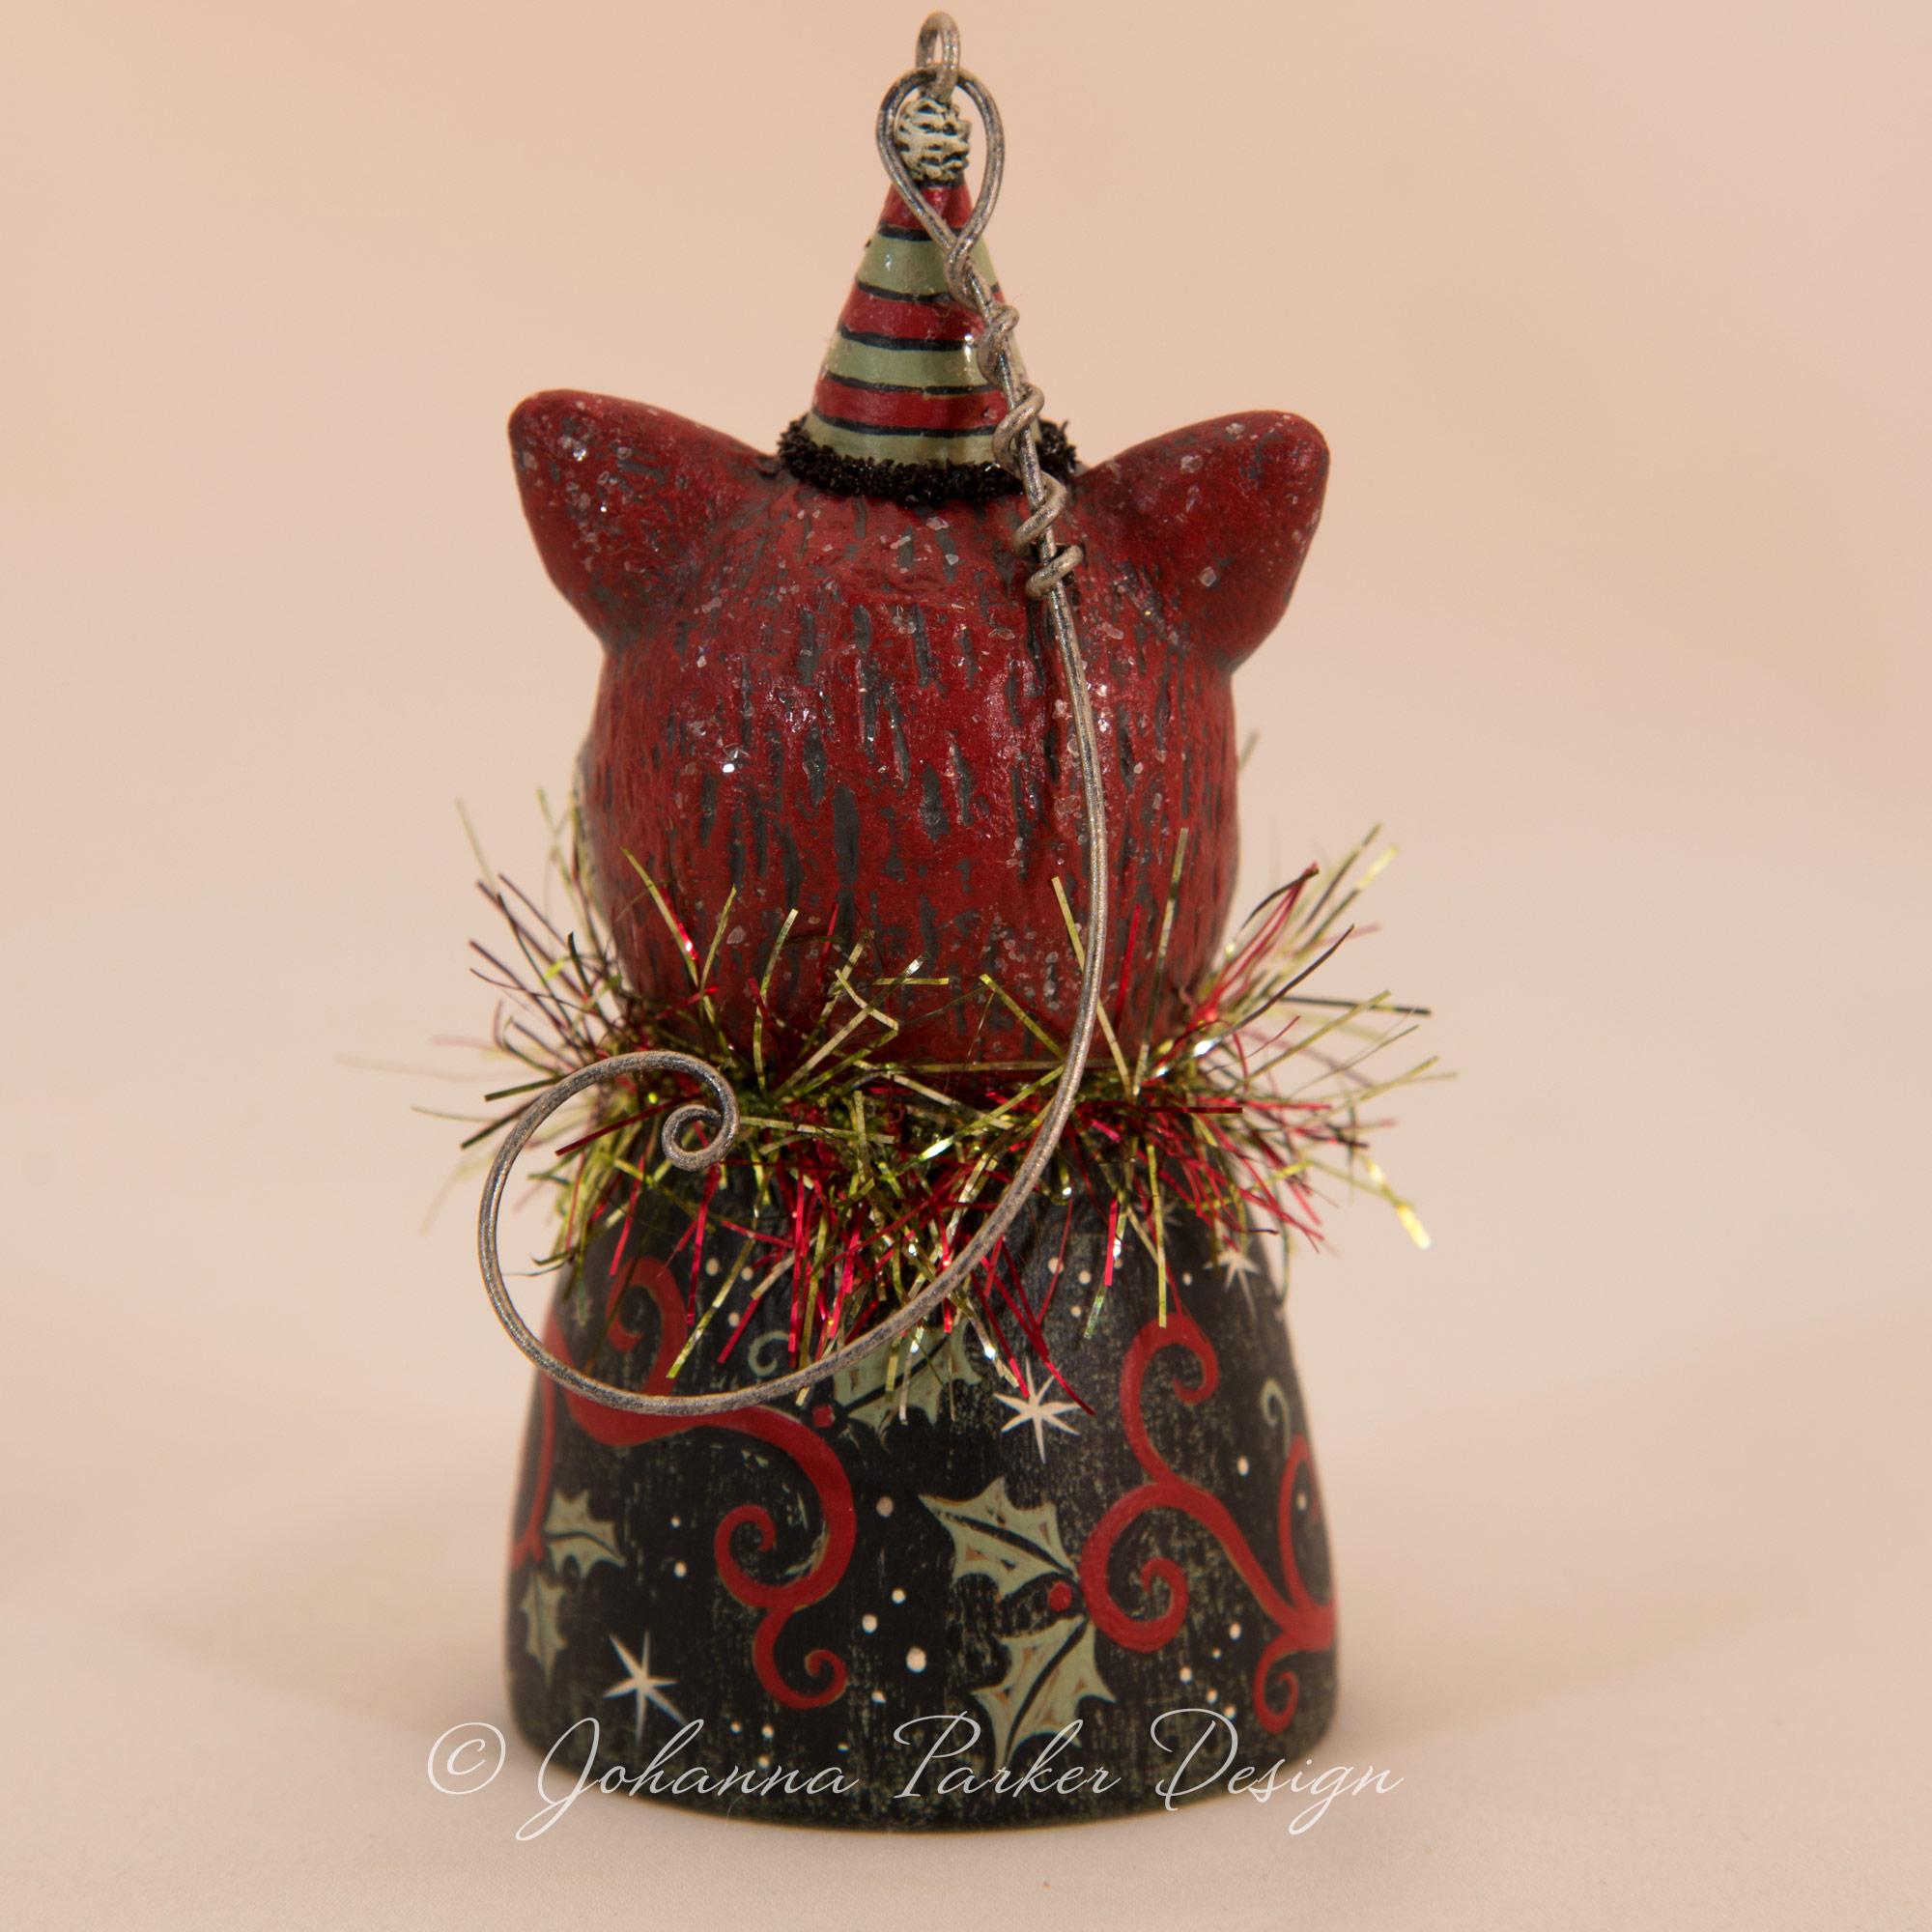 Johanna-Parker-Festive-Fox-Bell-Ornament-4.jpg